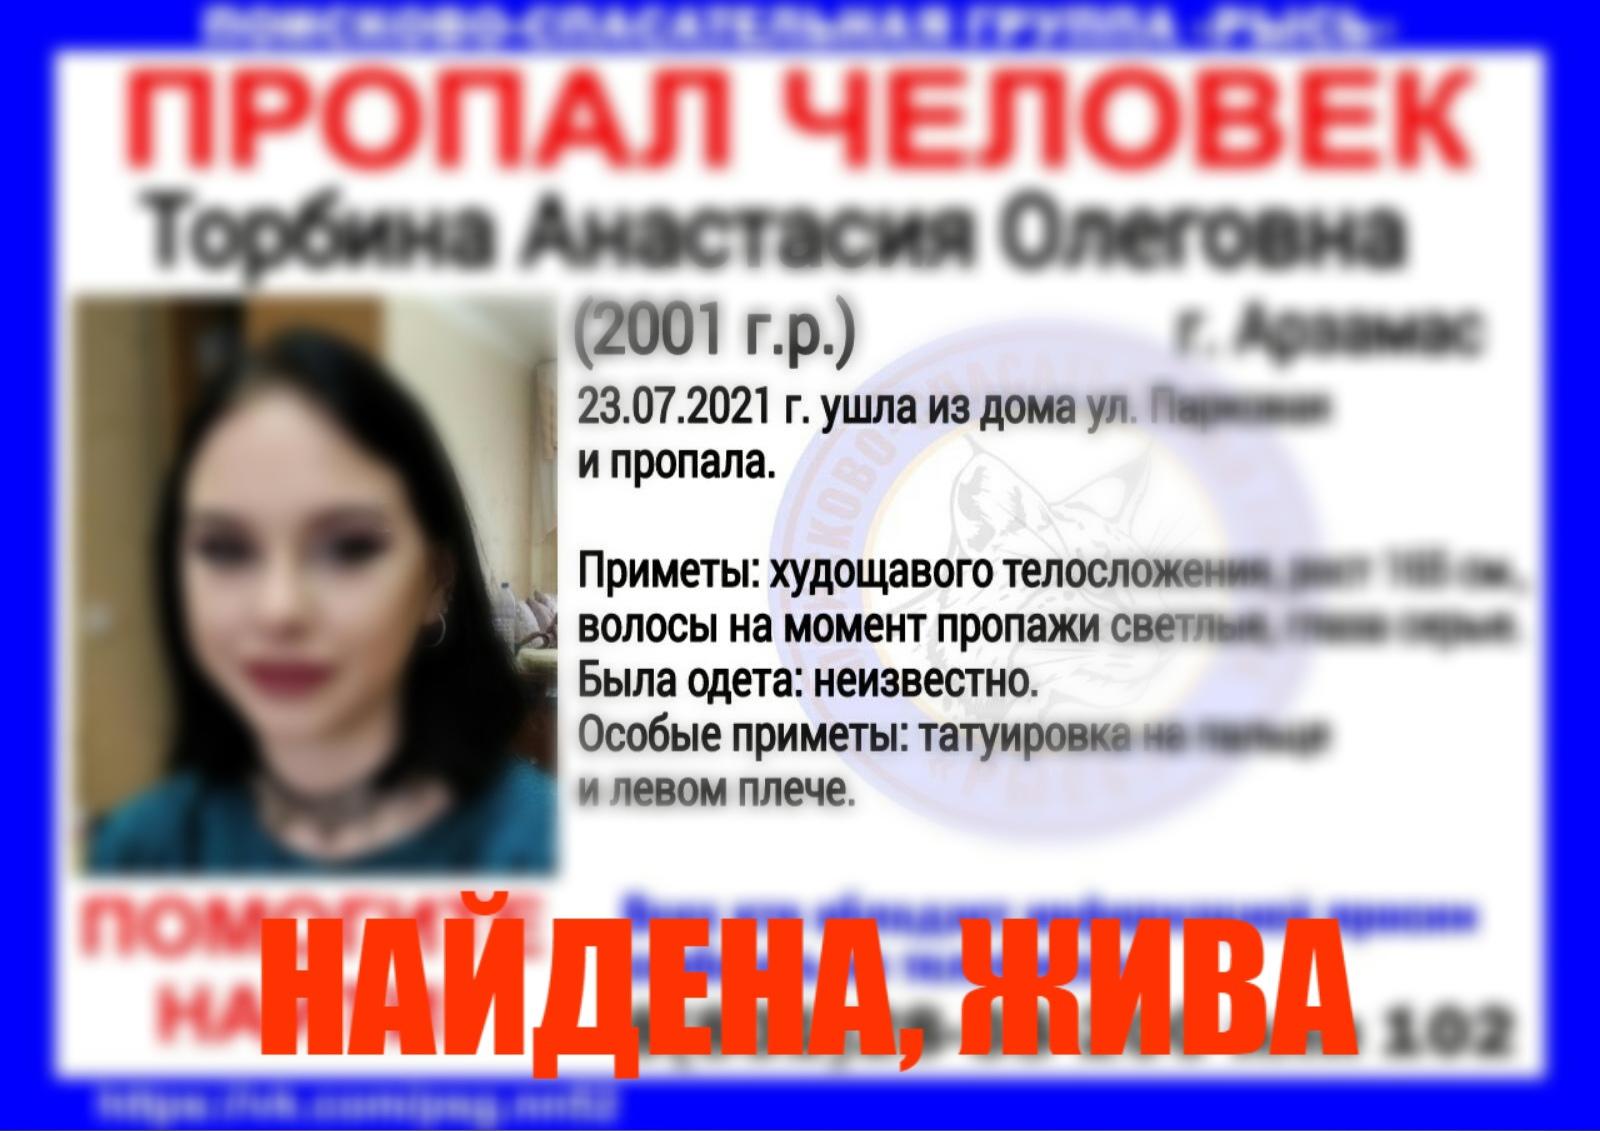 Торбина Анастасия Олеговна, 2001 г. р., г. Арзамас